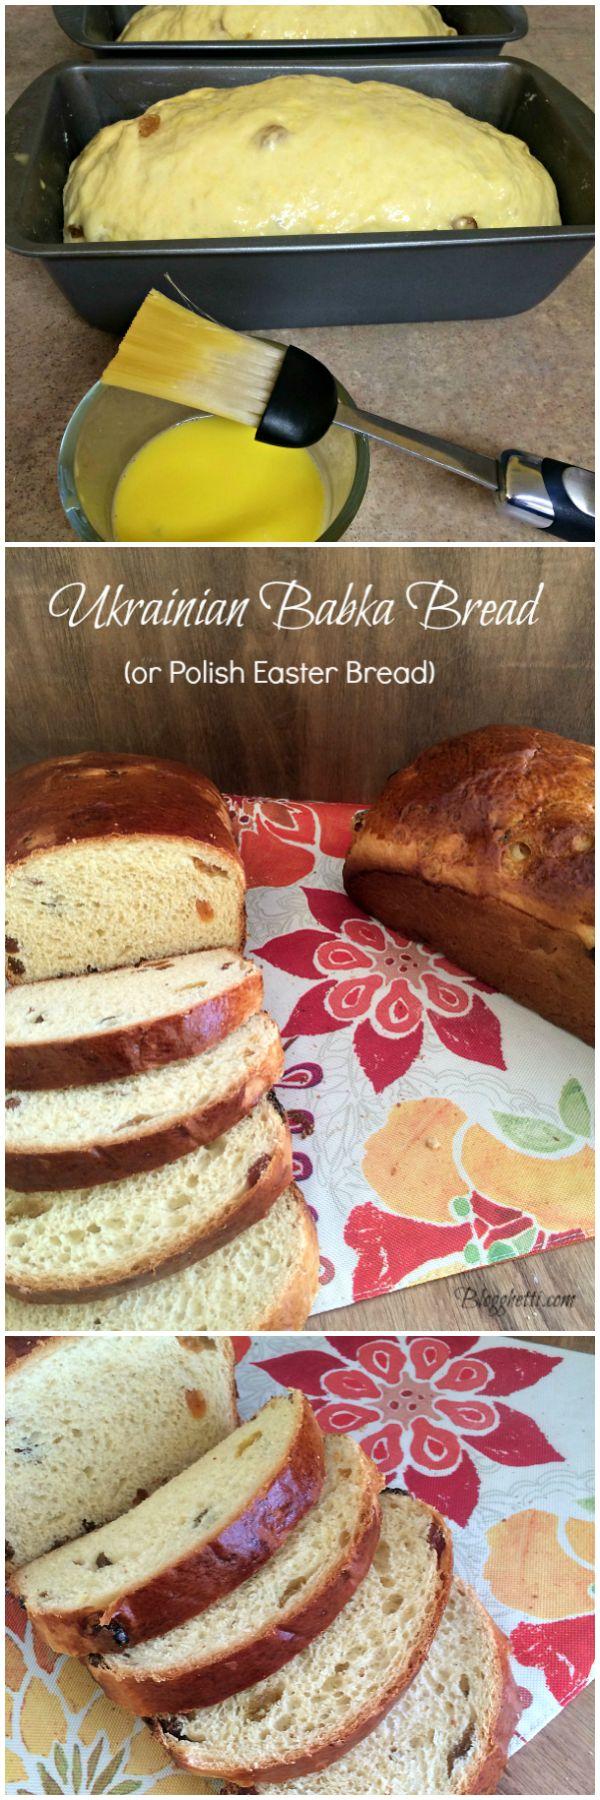 Ukrainian Babka Bread